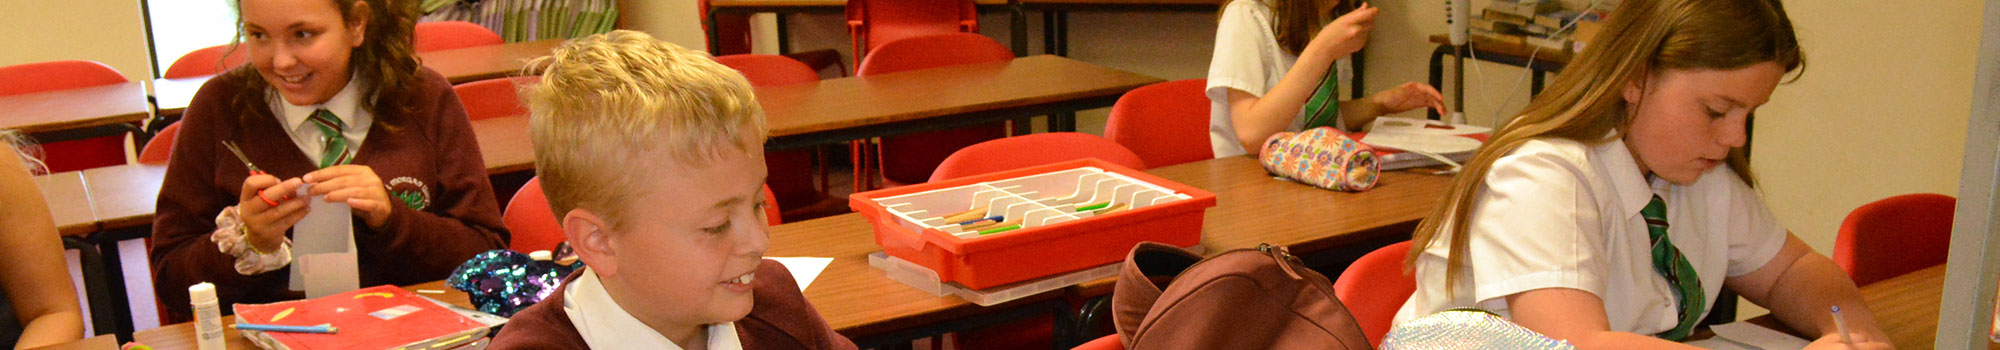 Pupils and facilities at Ysgol Morgan Llwyd in Wrexham